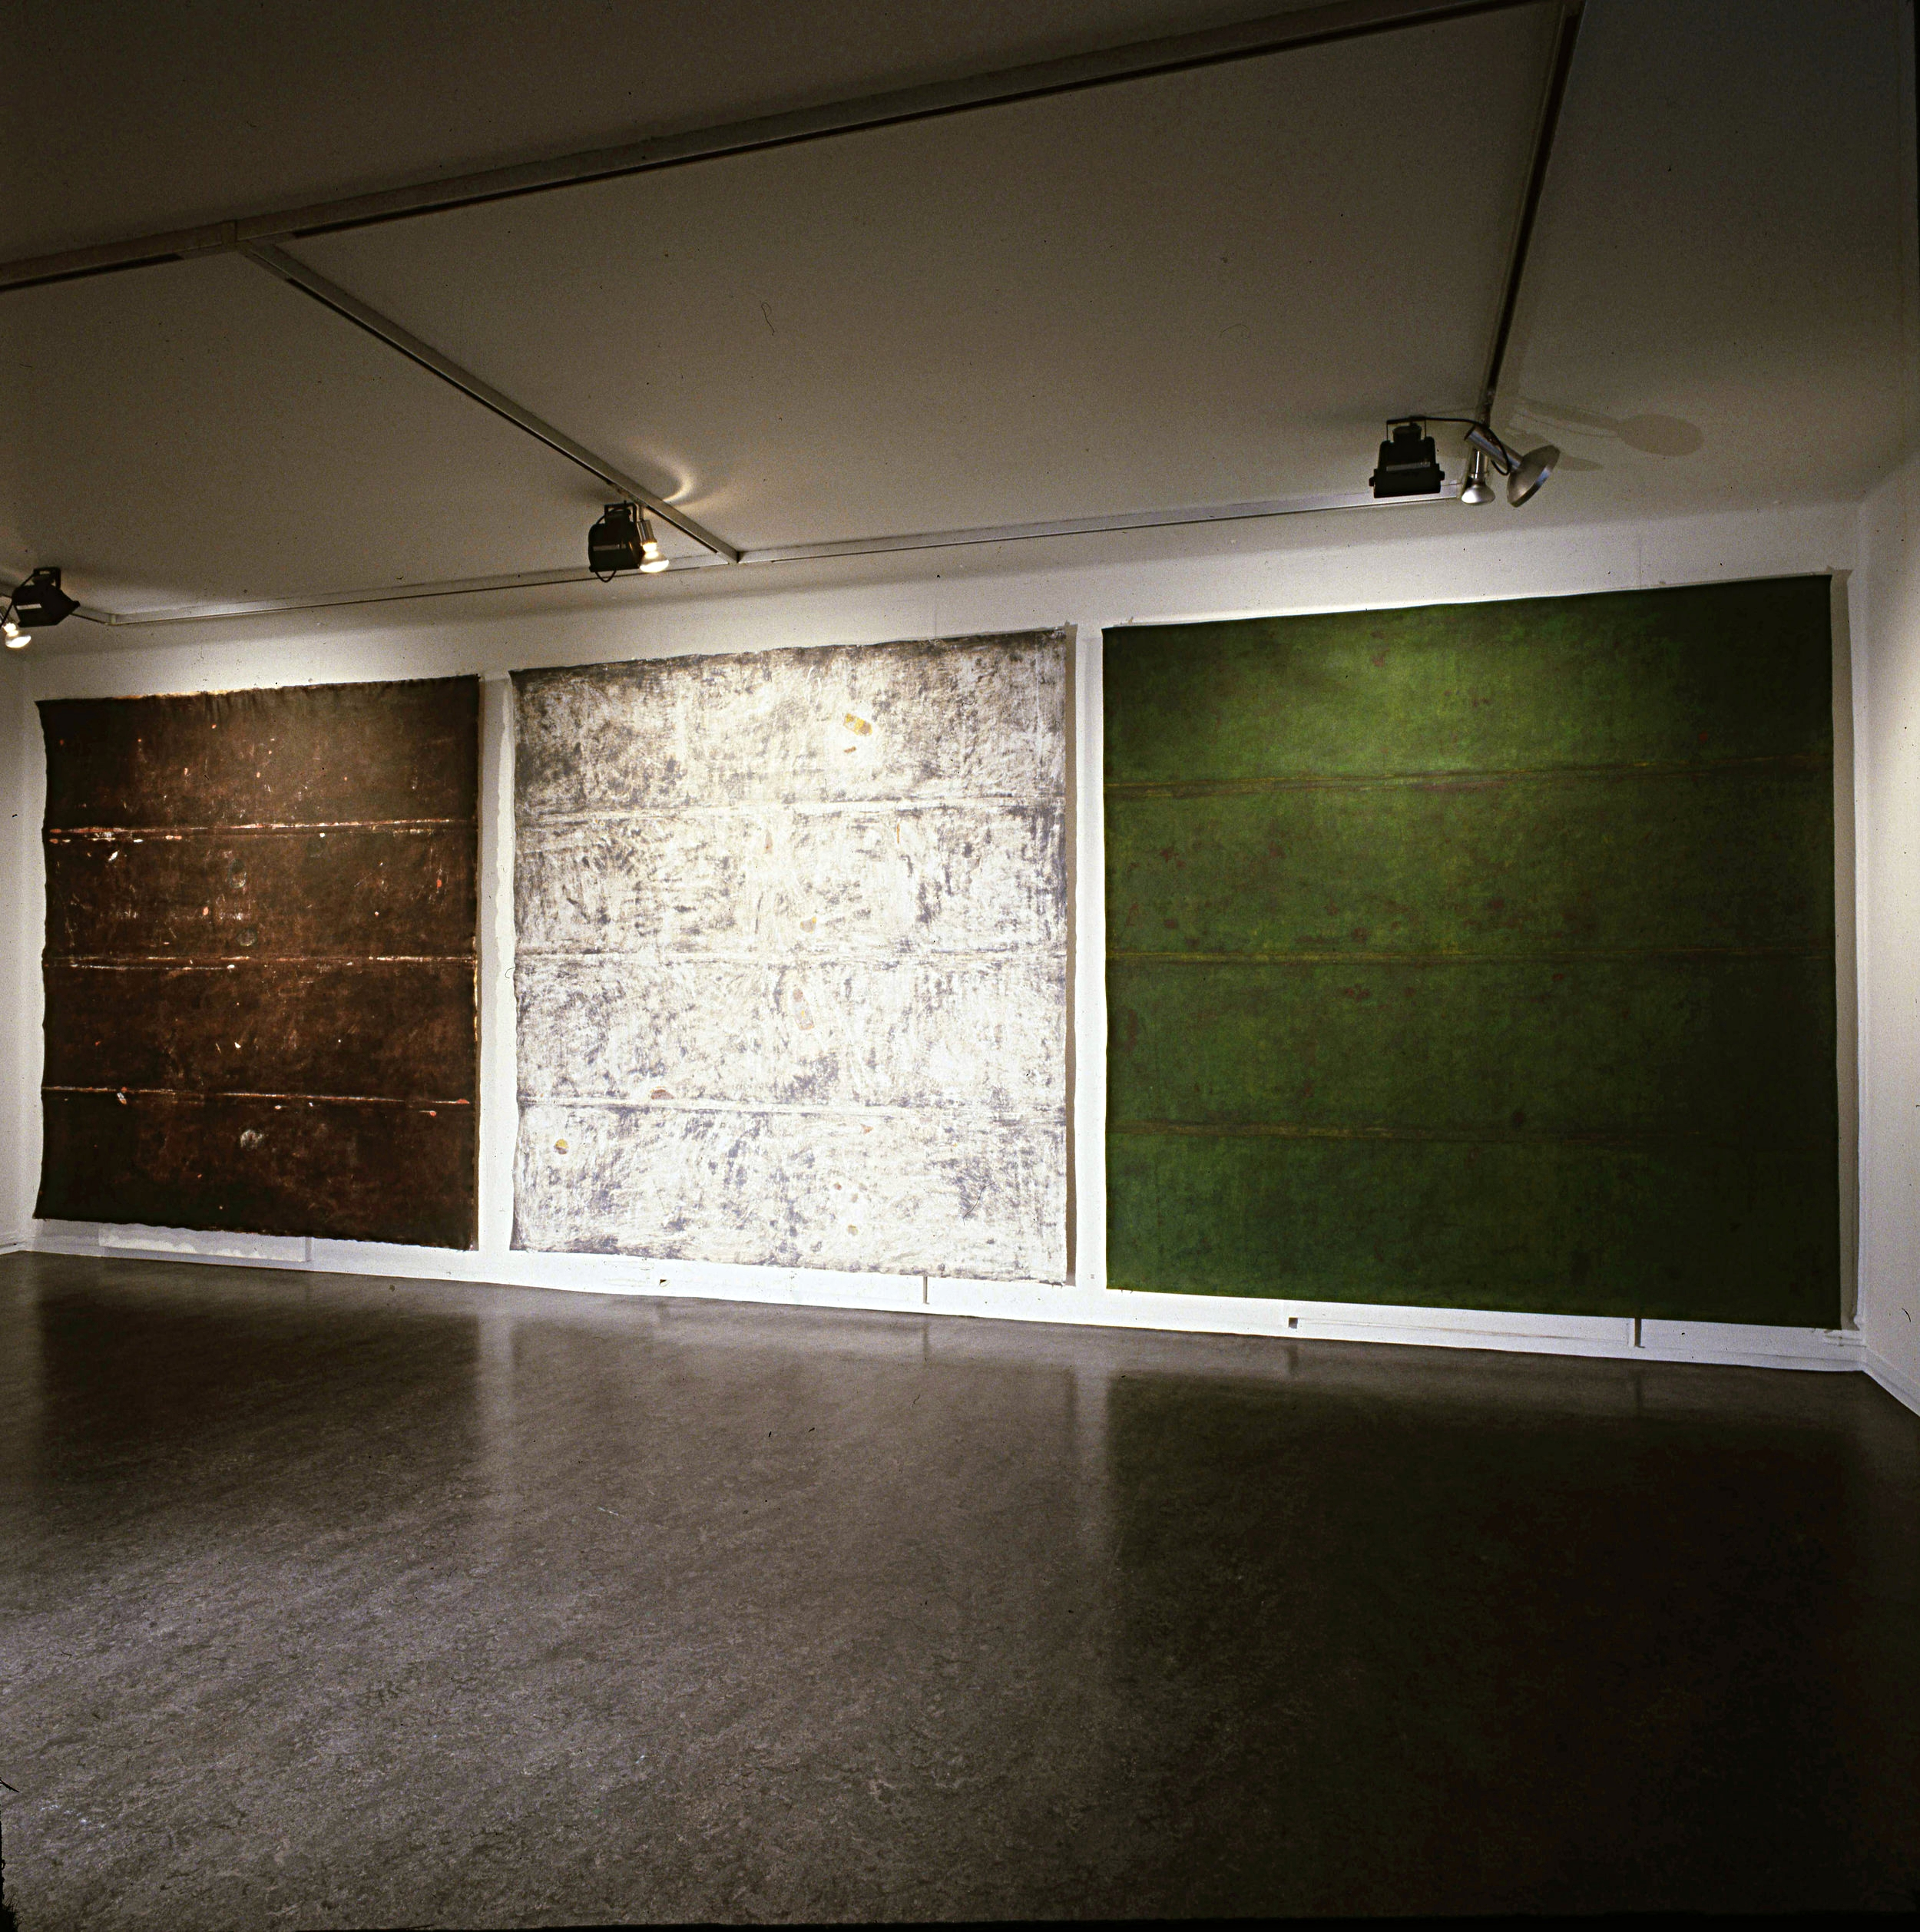 Installation view Kunstnerforbundet Oslo.  Tundra I II III.  1992. Pigment on cotton canvas. 240 x 240 cm.